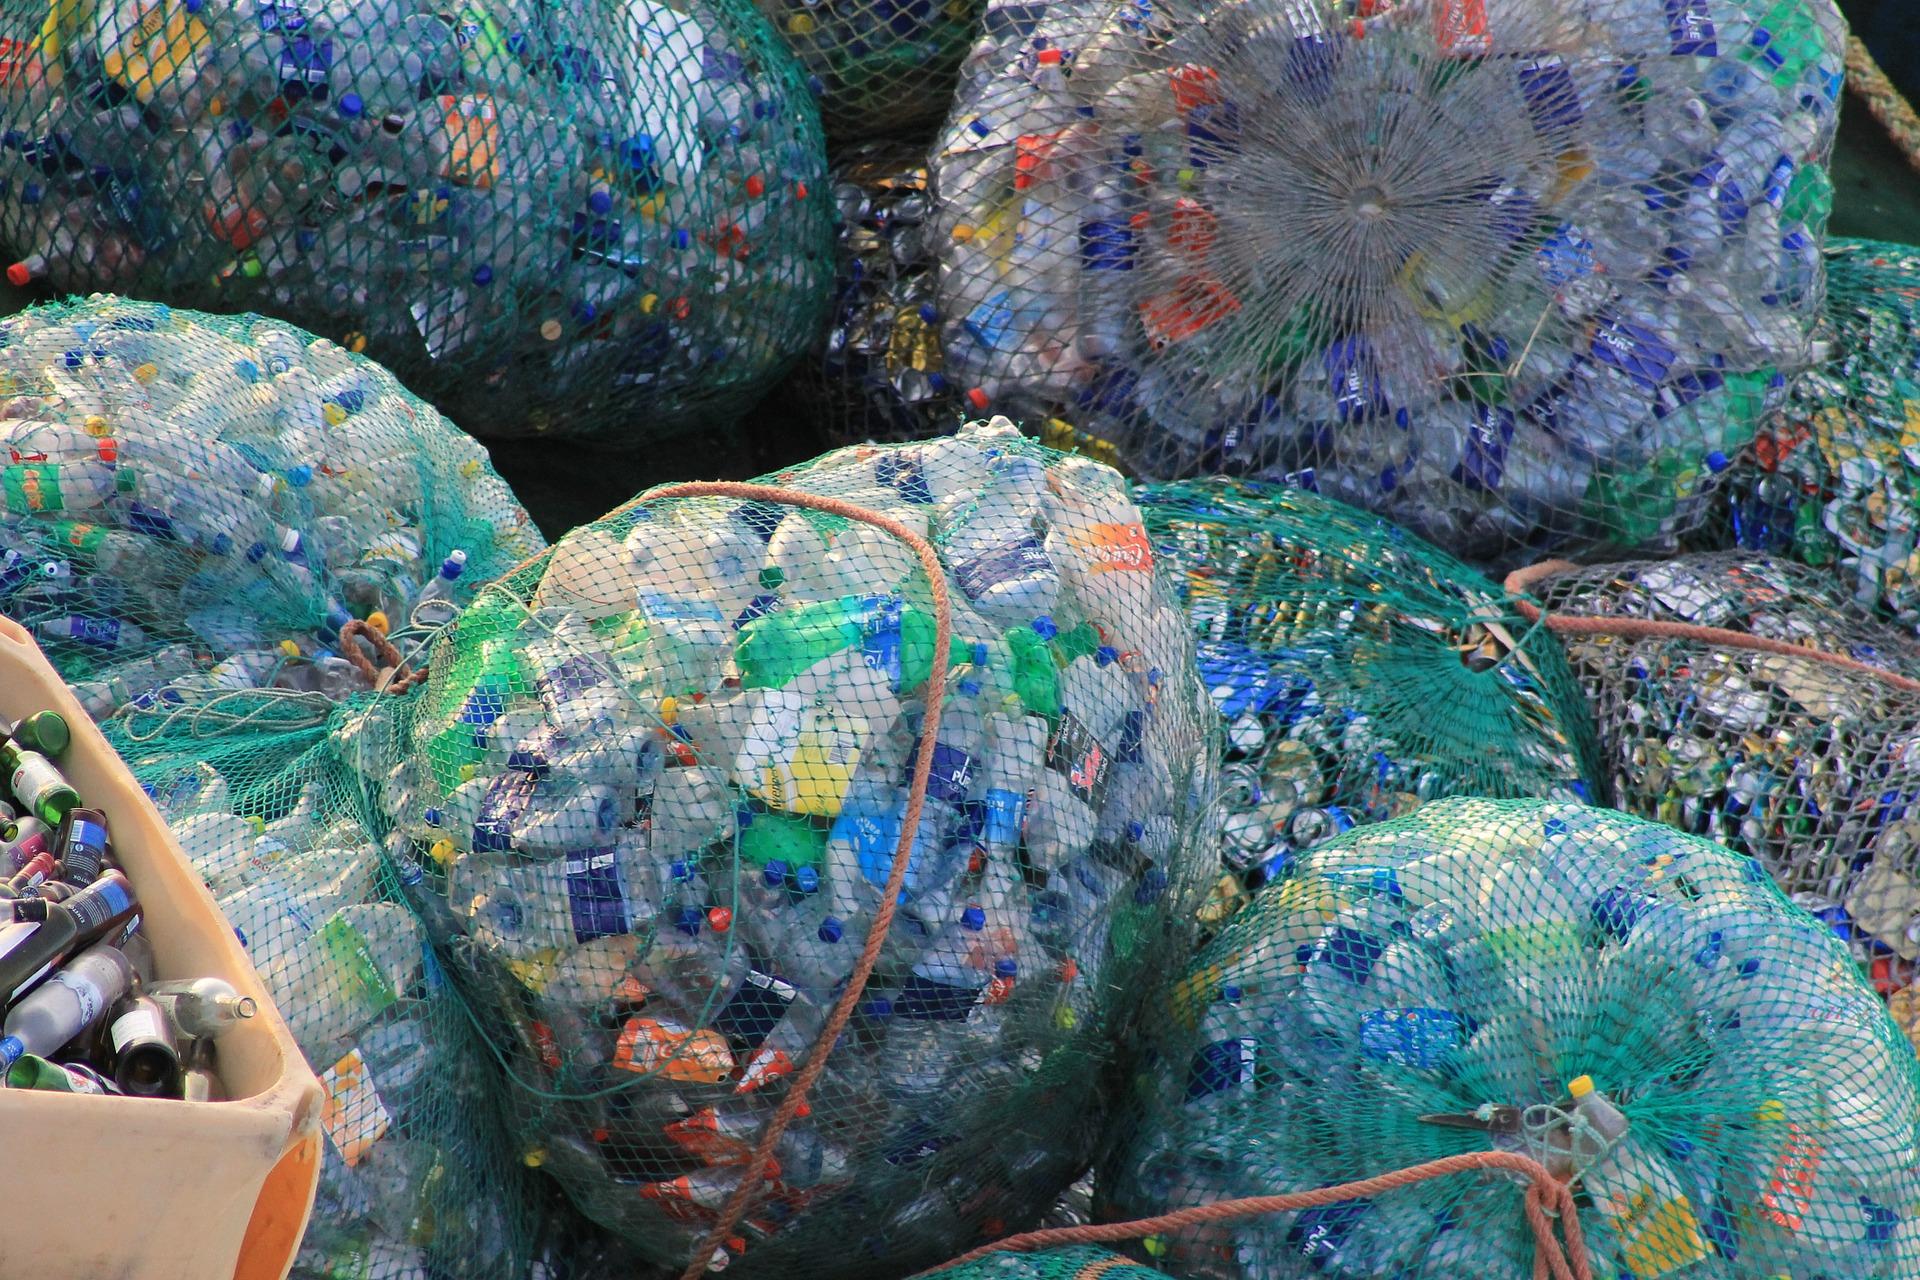 Procedimentos industriais na coleta de resíduos